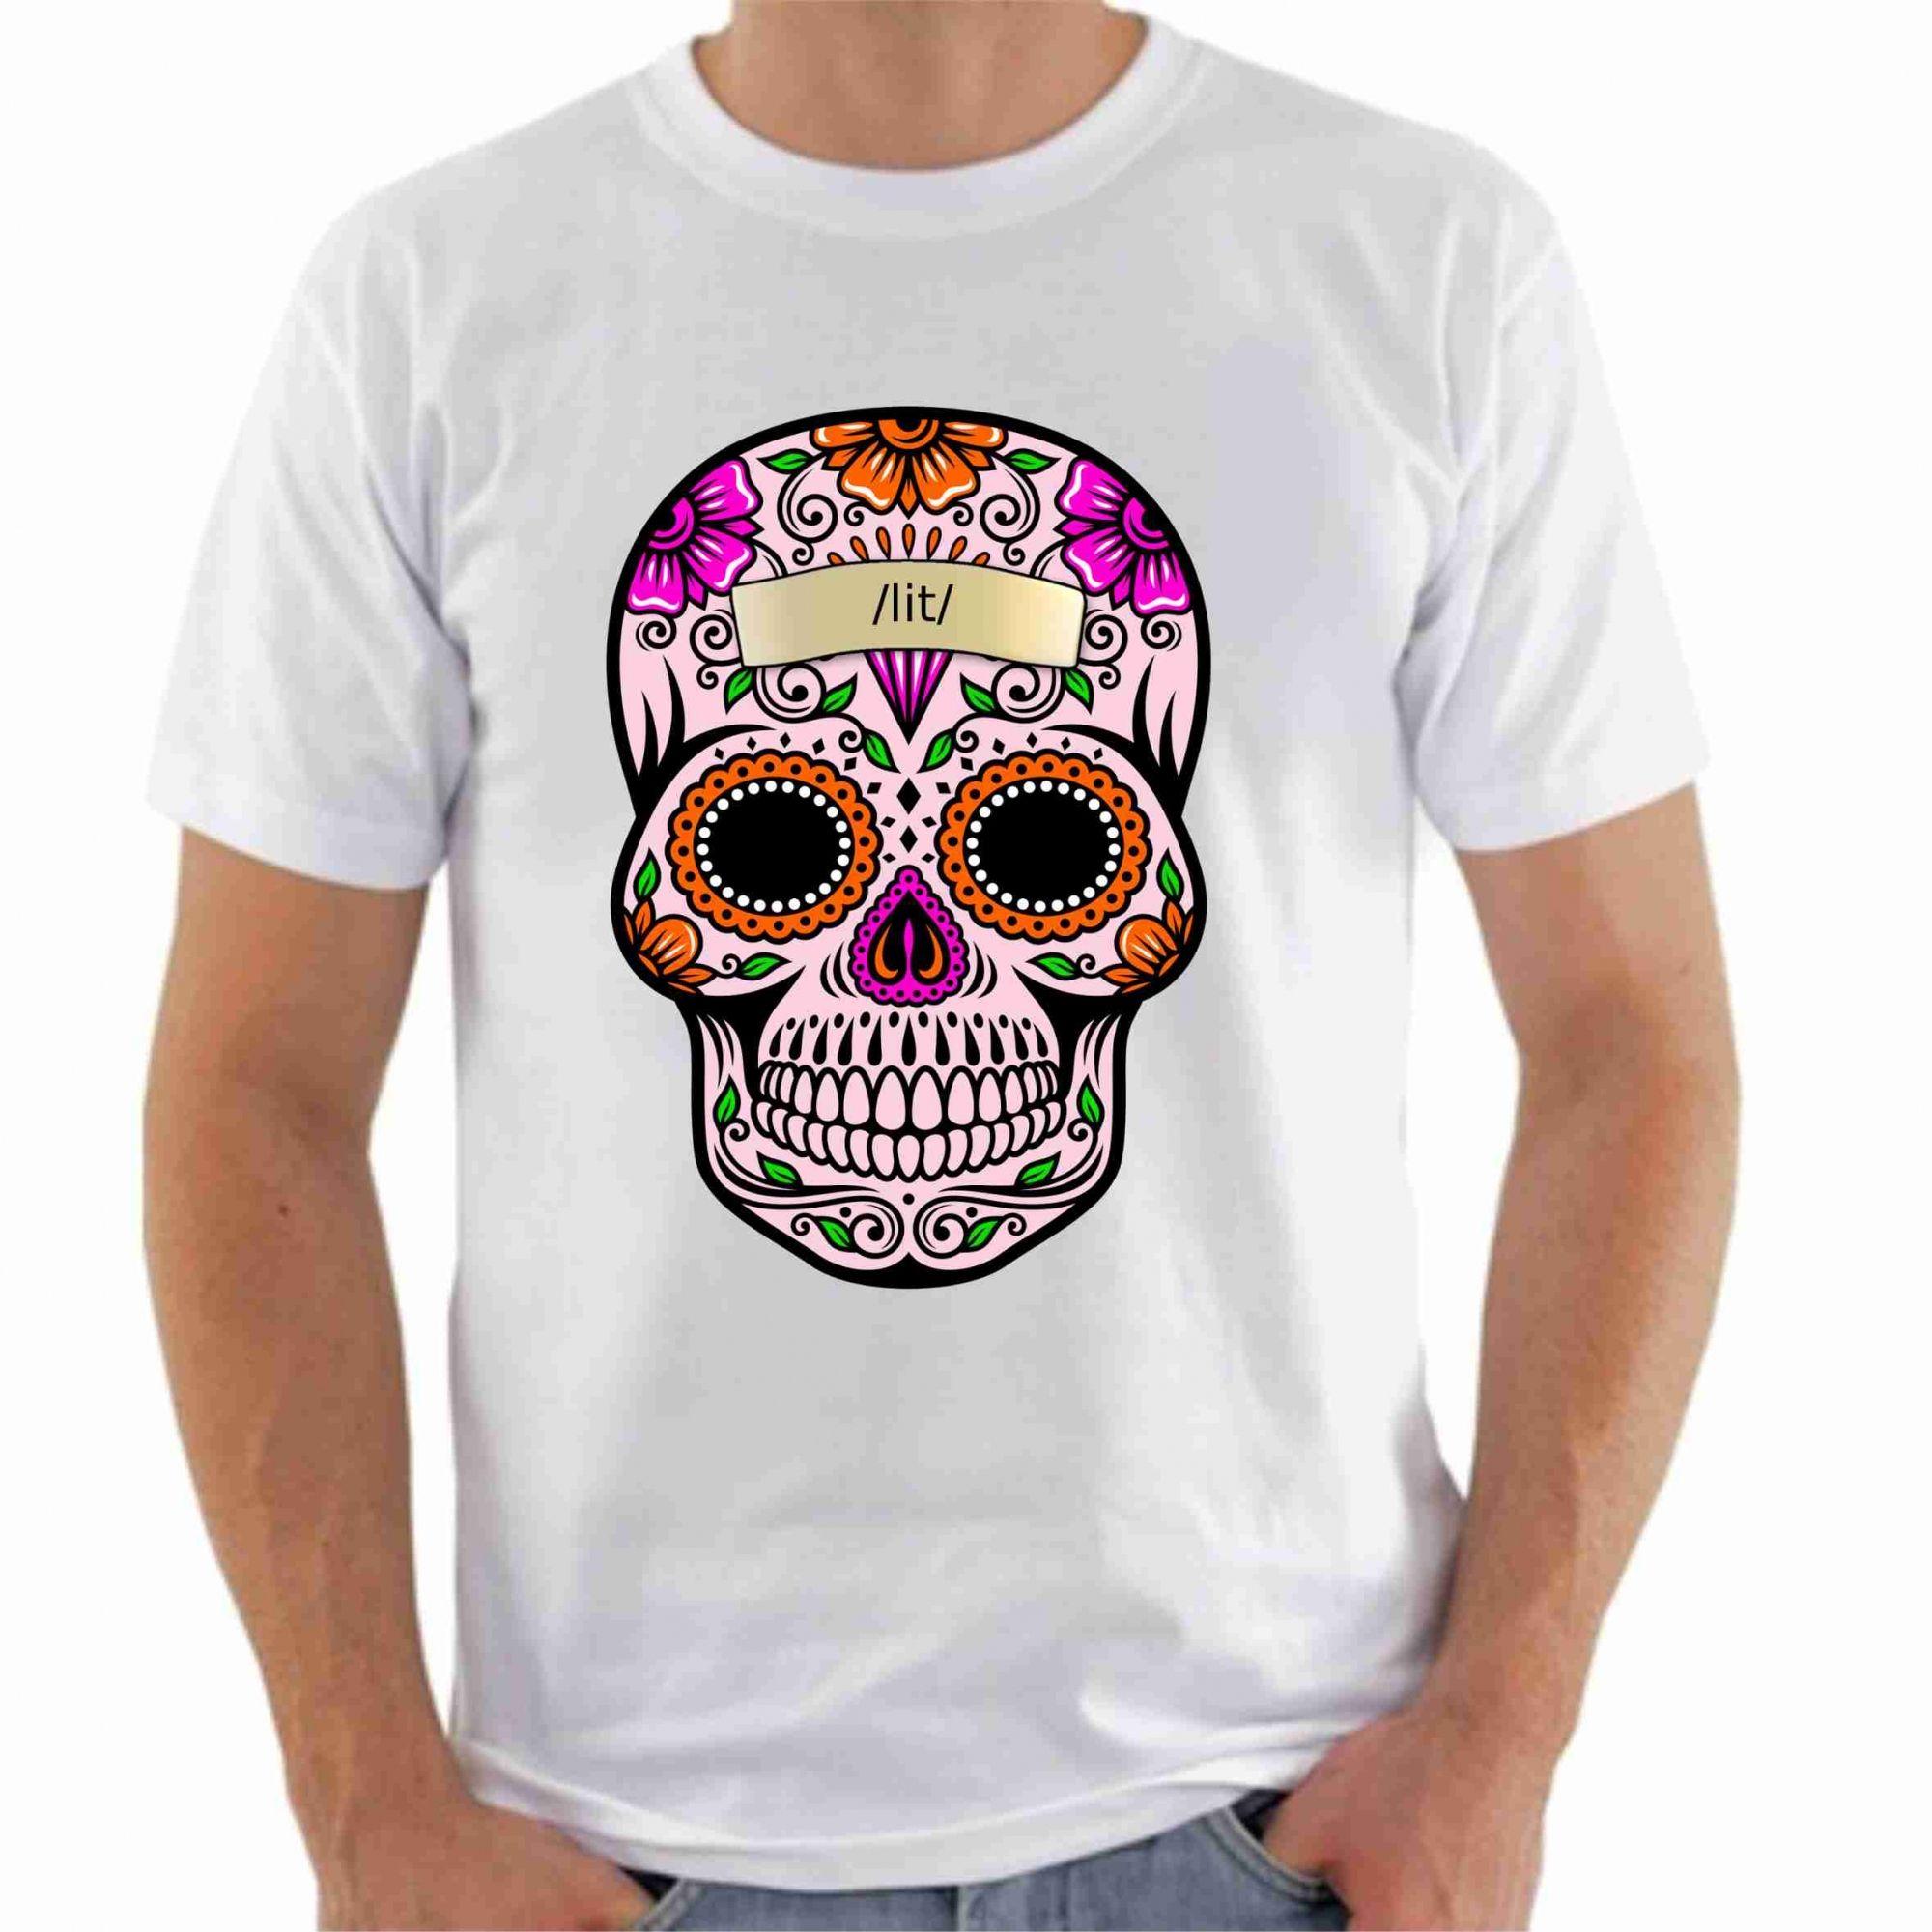 87f420168a Camiseta Estampa Caveira - Fábrica de Camisetas Impakto ...